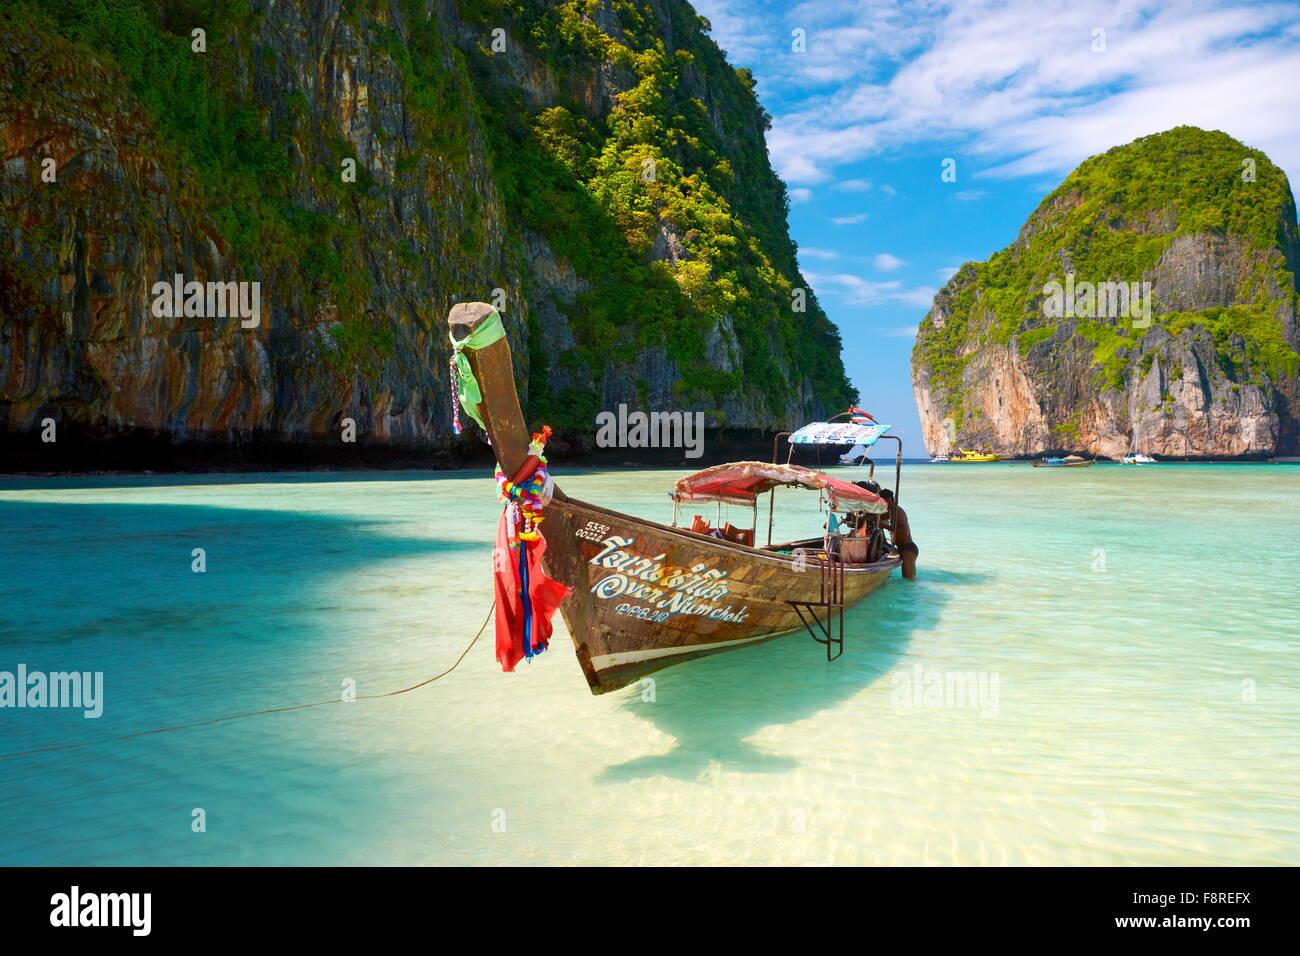 Thailandia - tropical Maya Bay sull isola di Phi Phi Leh isola, mare delle Andamane Immagini Stock